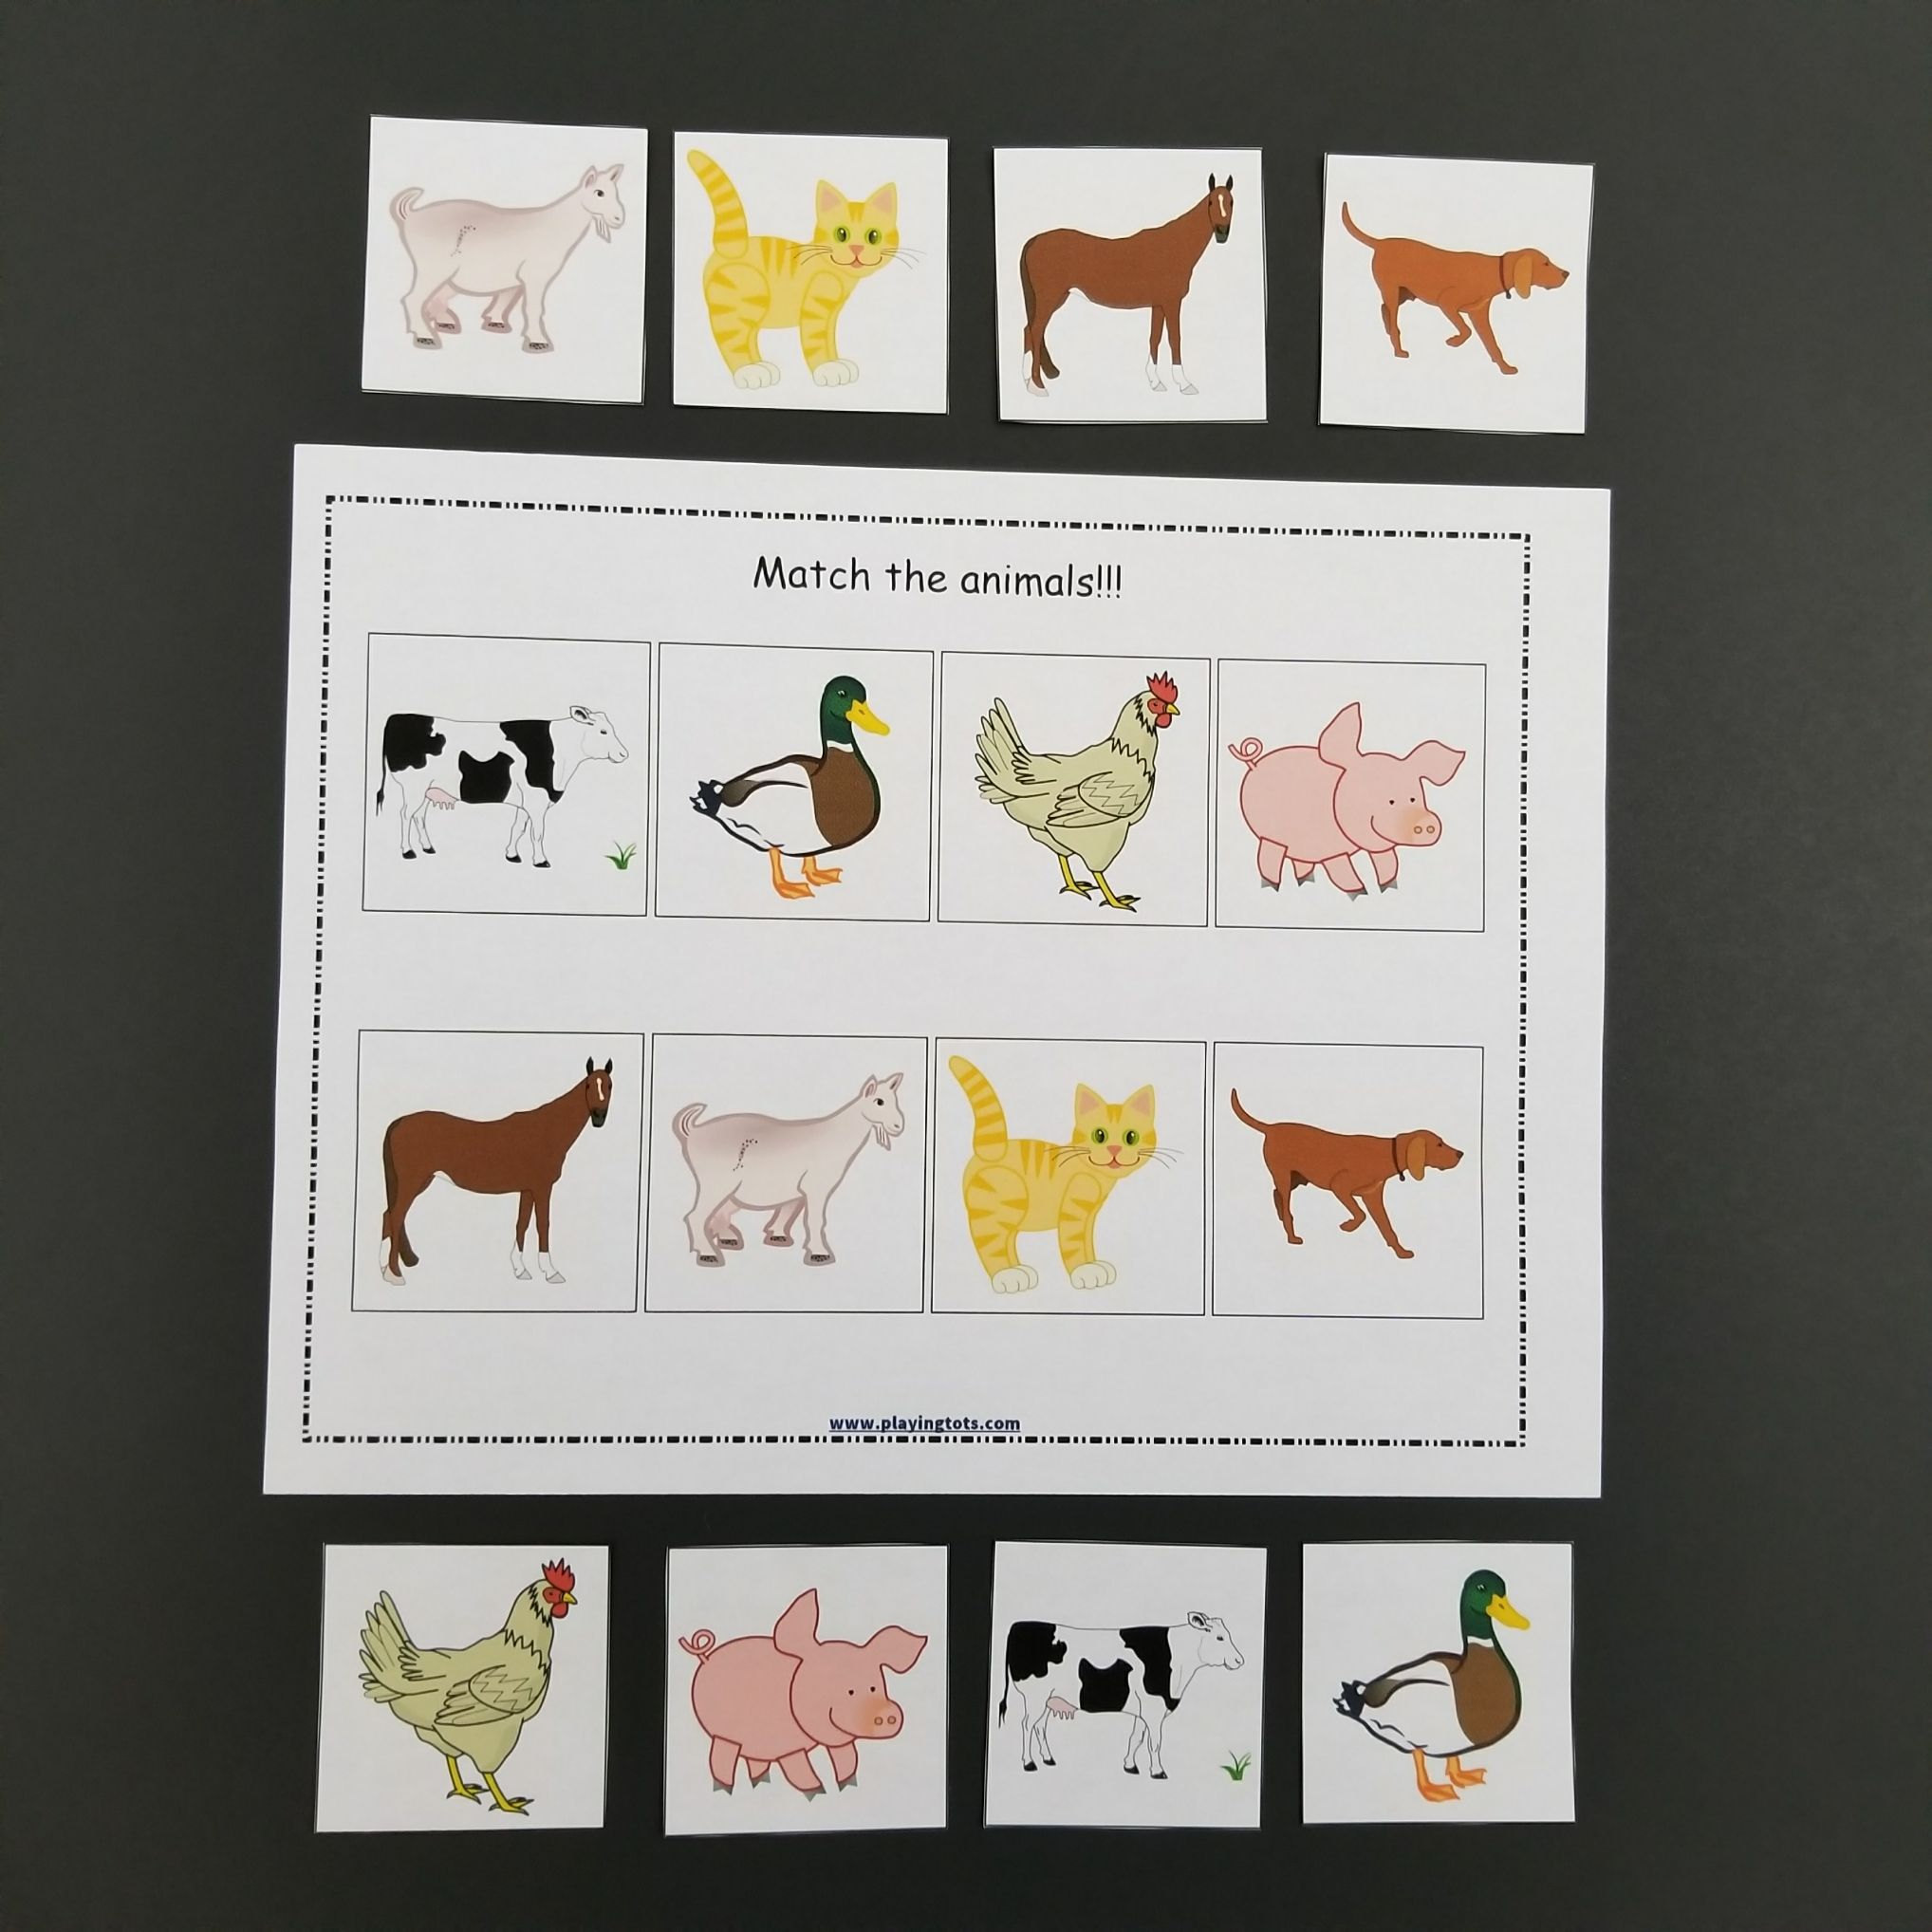 Match The Animals Keywords Activity File Folder Kids